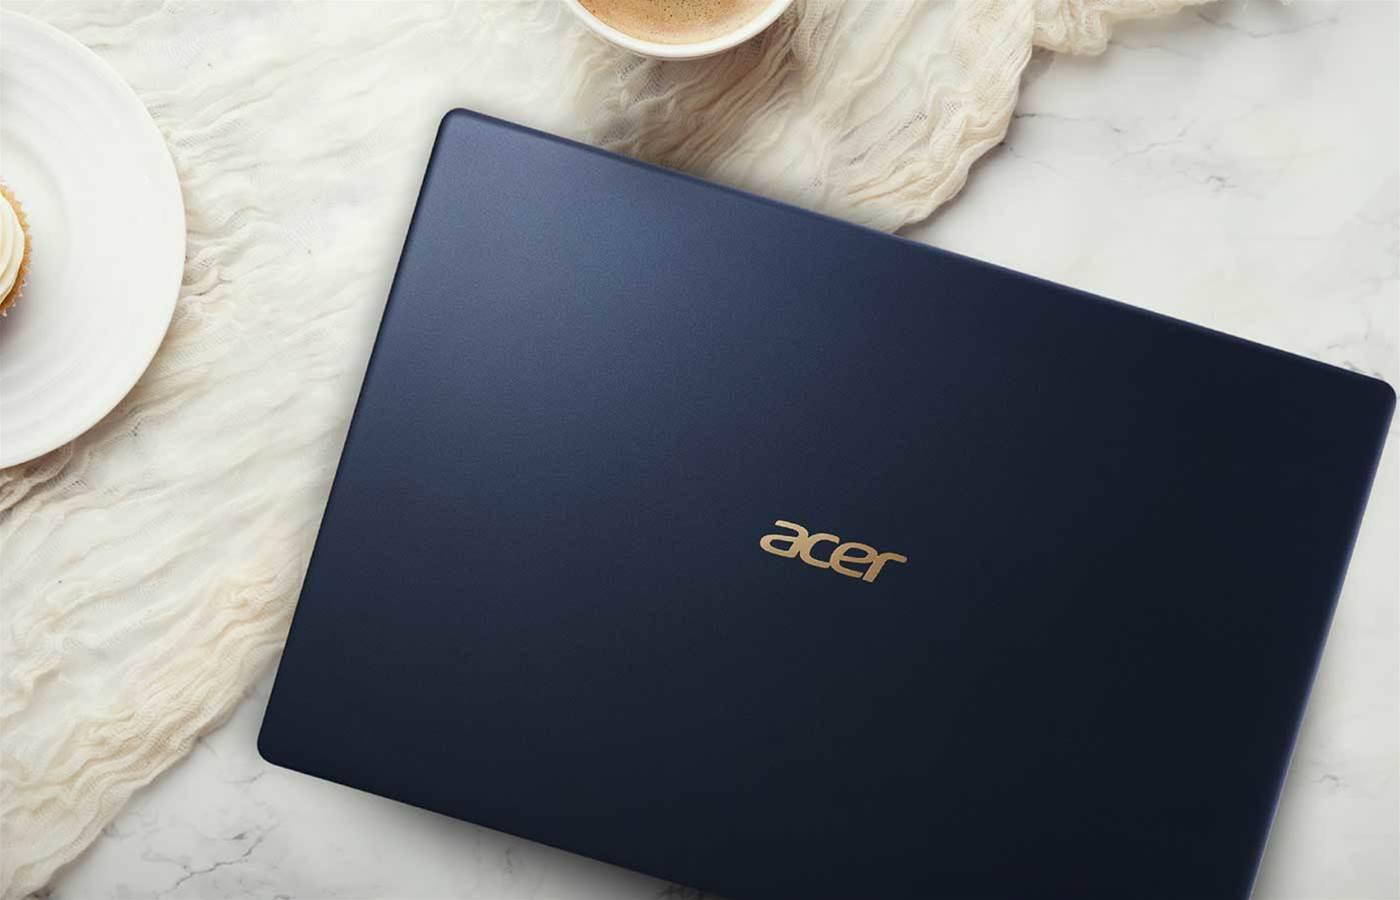 Acer Australia profits fall $2 million